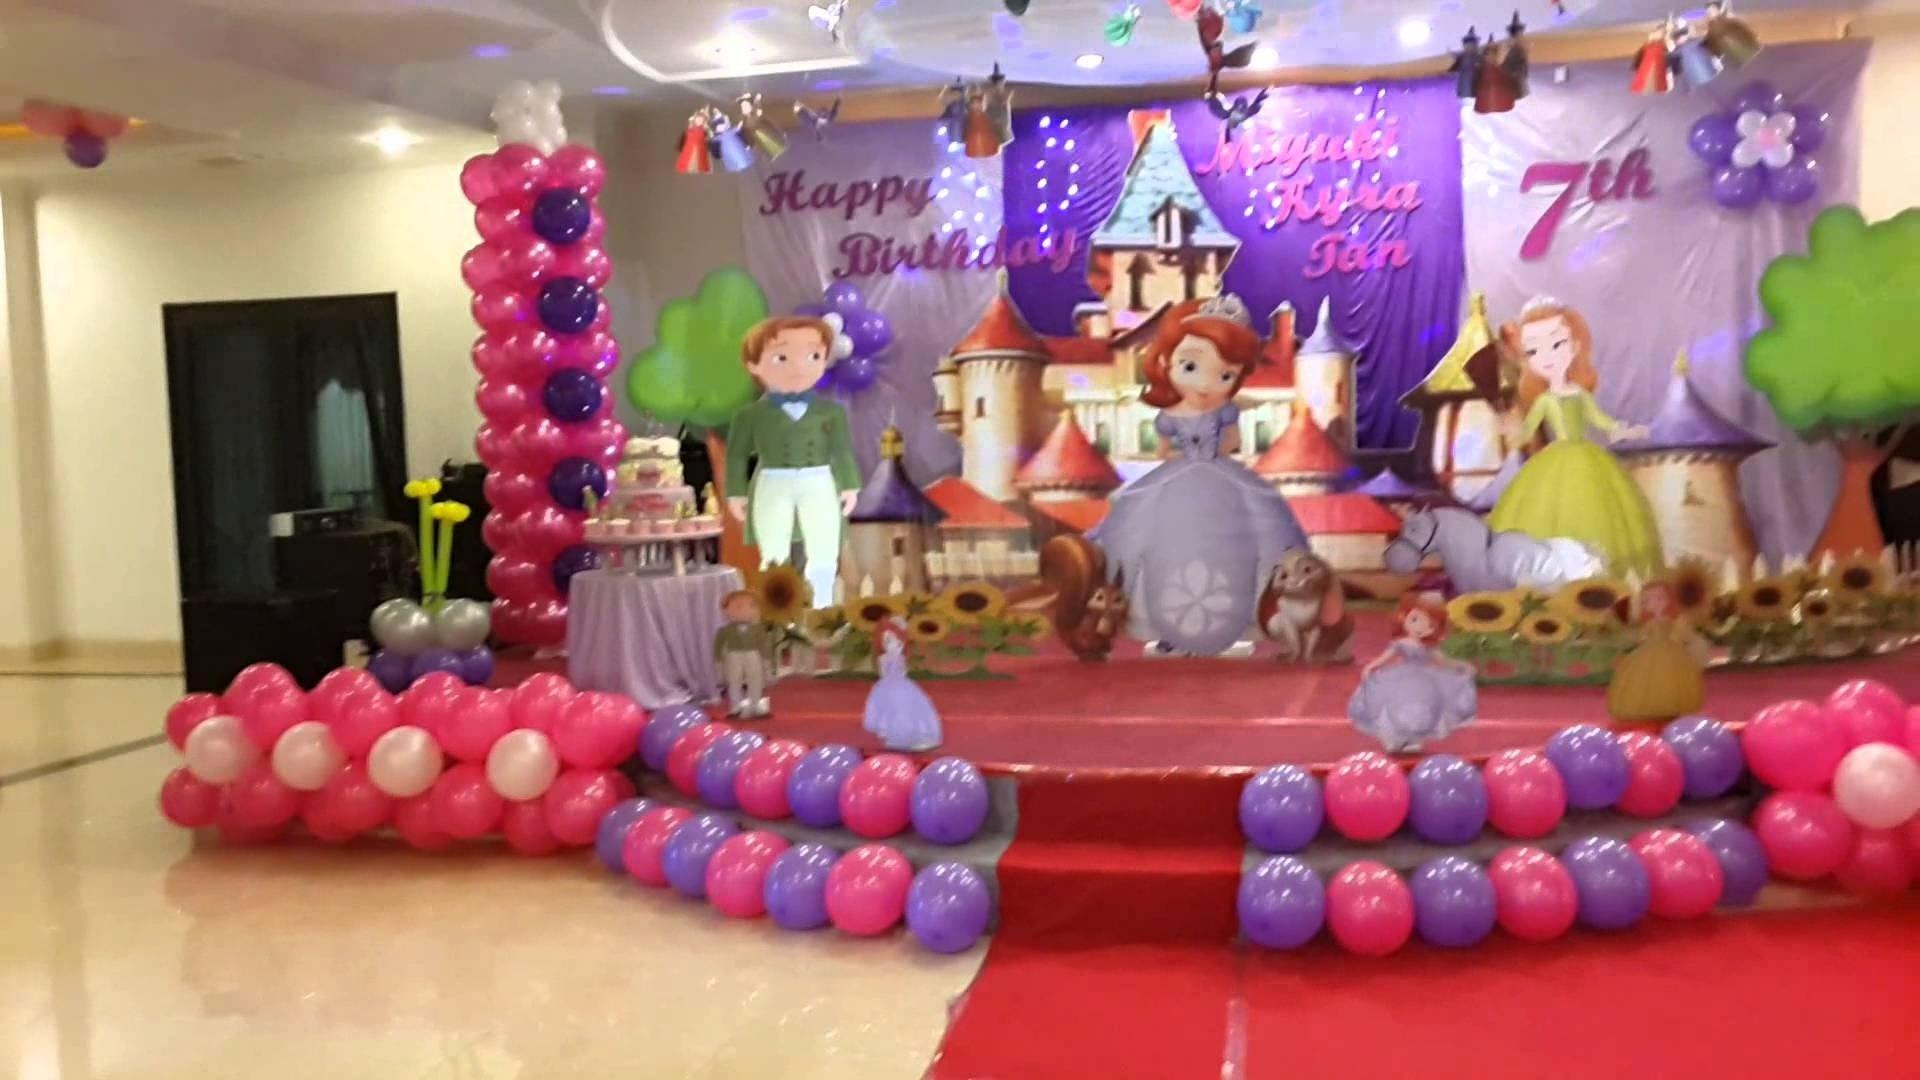 10 Stylish 1St Birthday Party Decoration Ideas sofia the first birthday theme youtube 1